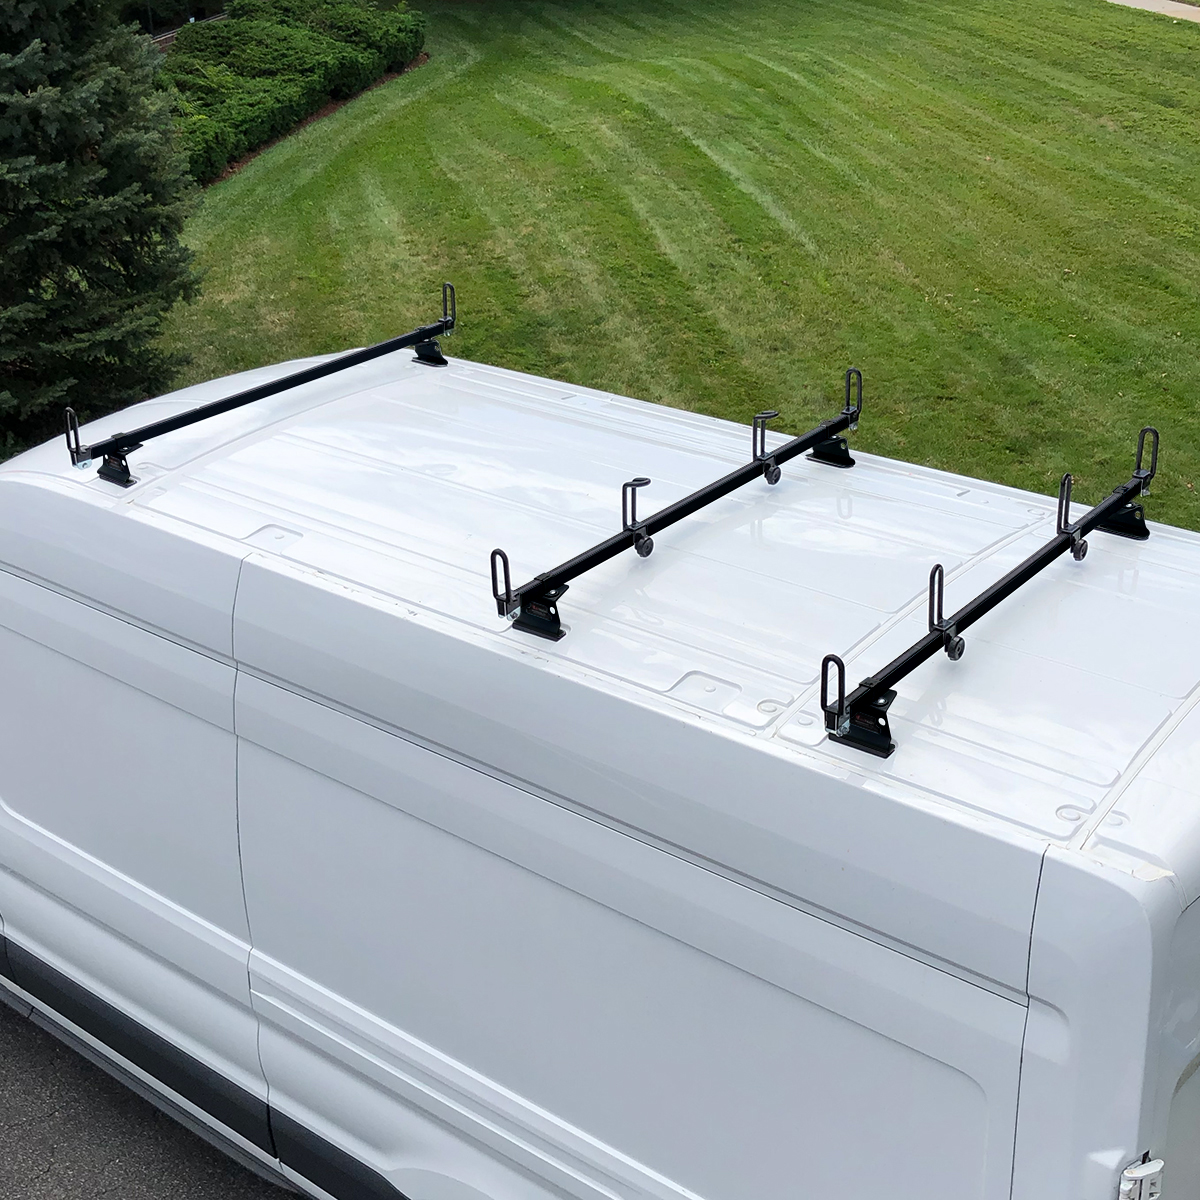 vantech heavy duty 3 bar ladder roof rack fits ford transit cargo van high roof